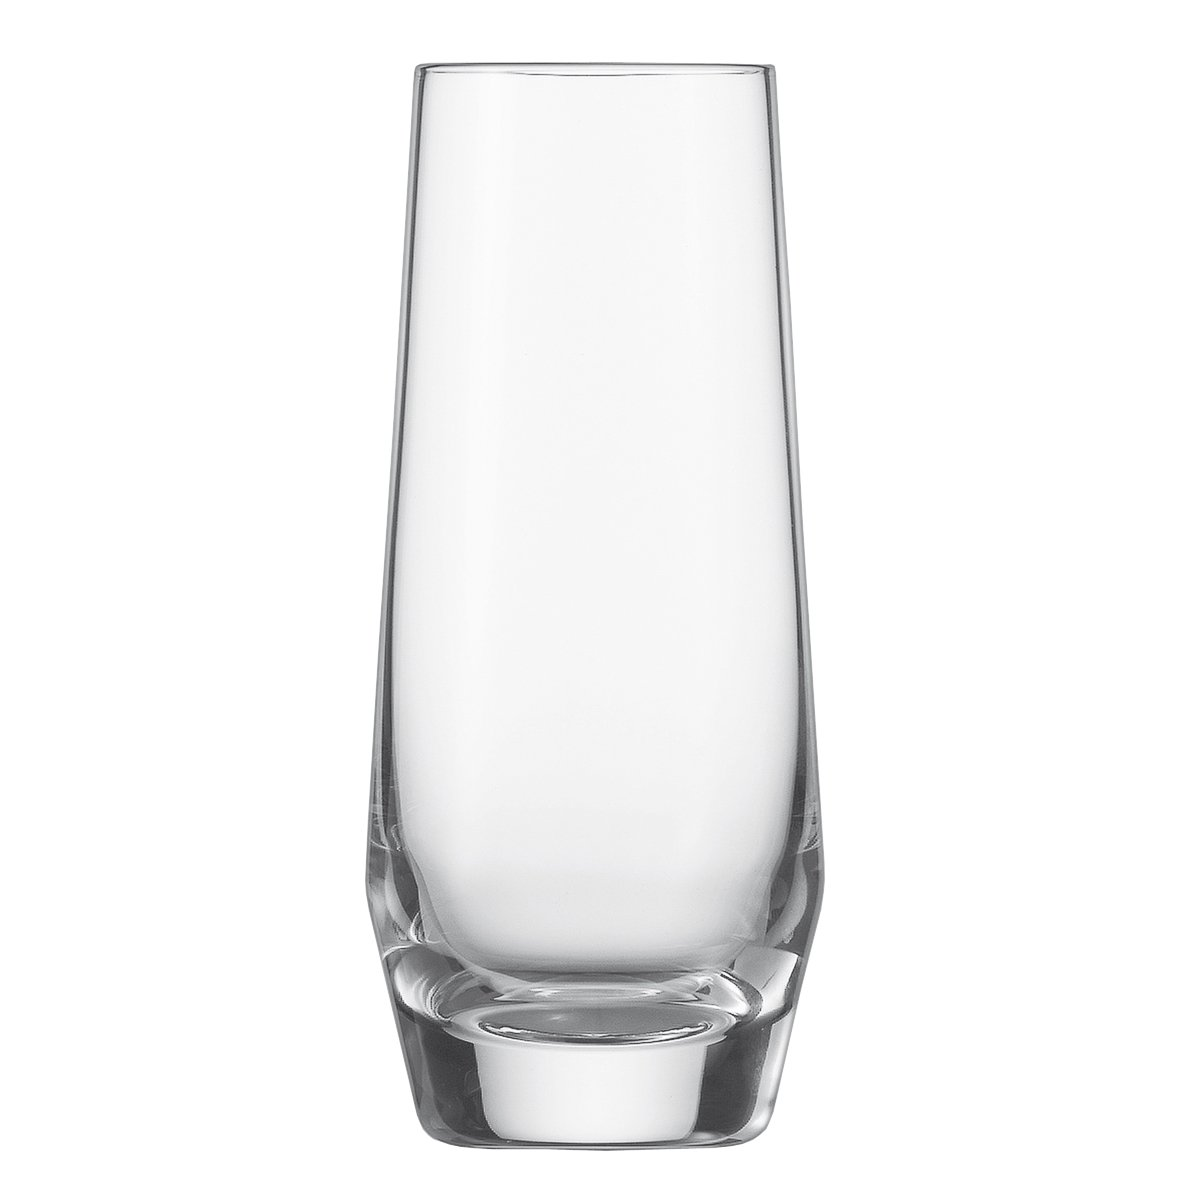 Schott Zwiesel Tritan Crystal Glass Pure Barware Collection Averna/Juice/Apperitif Cocktail Glass, 8.3-Ounce, Set of 6